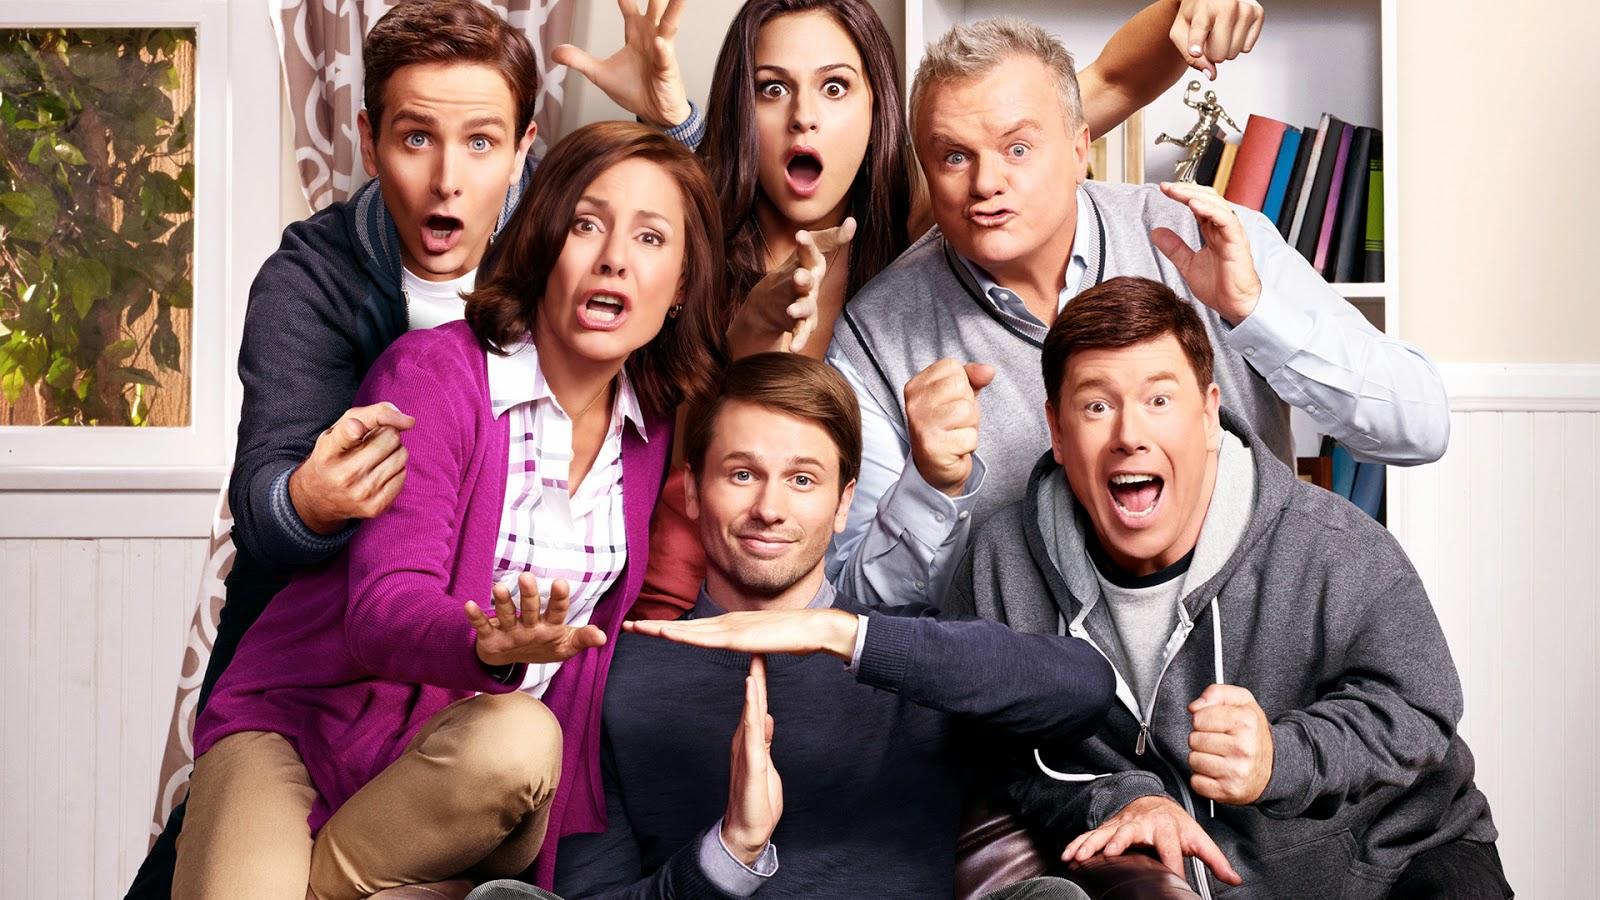 The McCarthys - CBS Orders 2 More Scripts